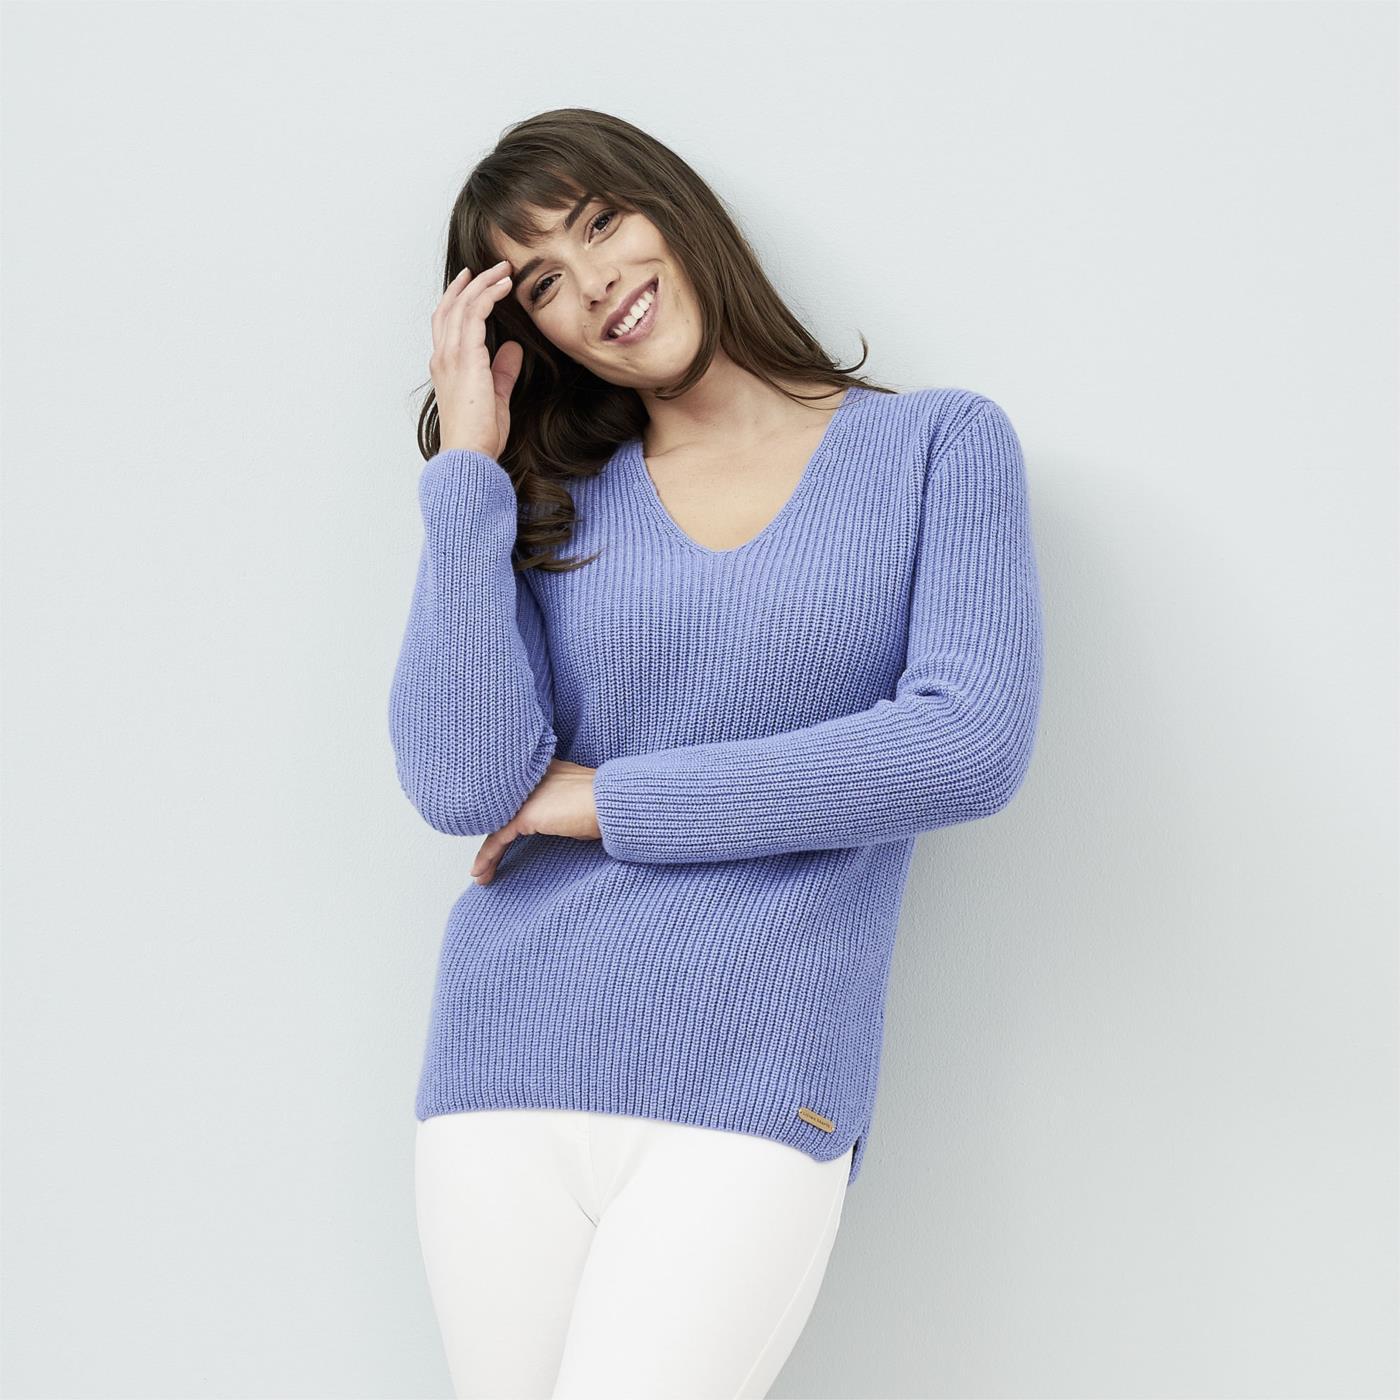 Hortense Sweater